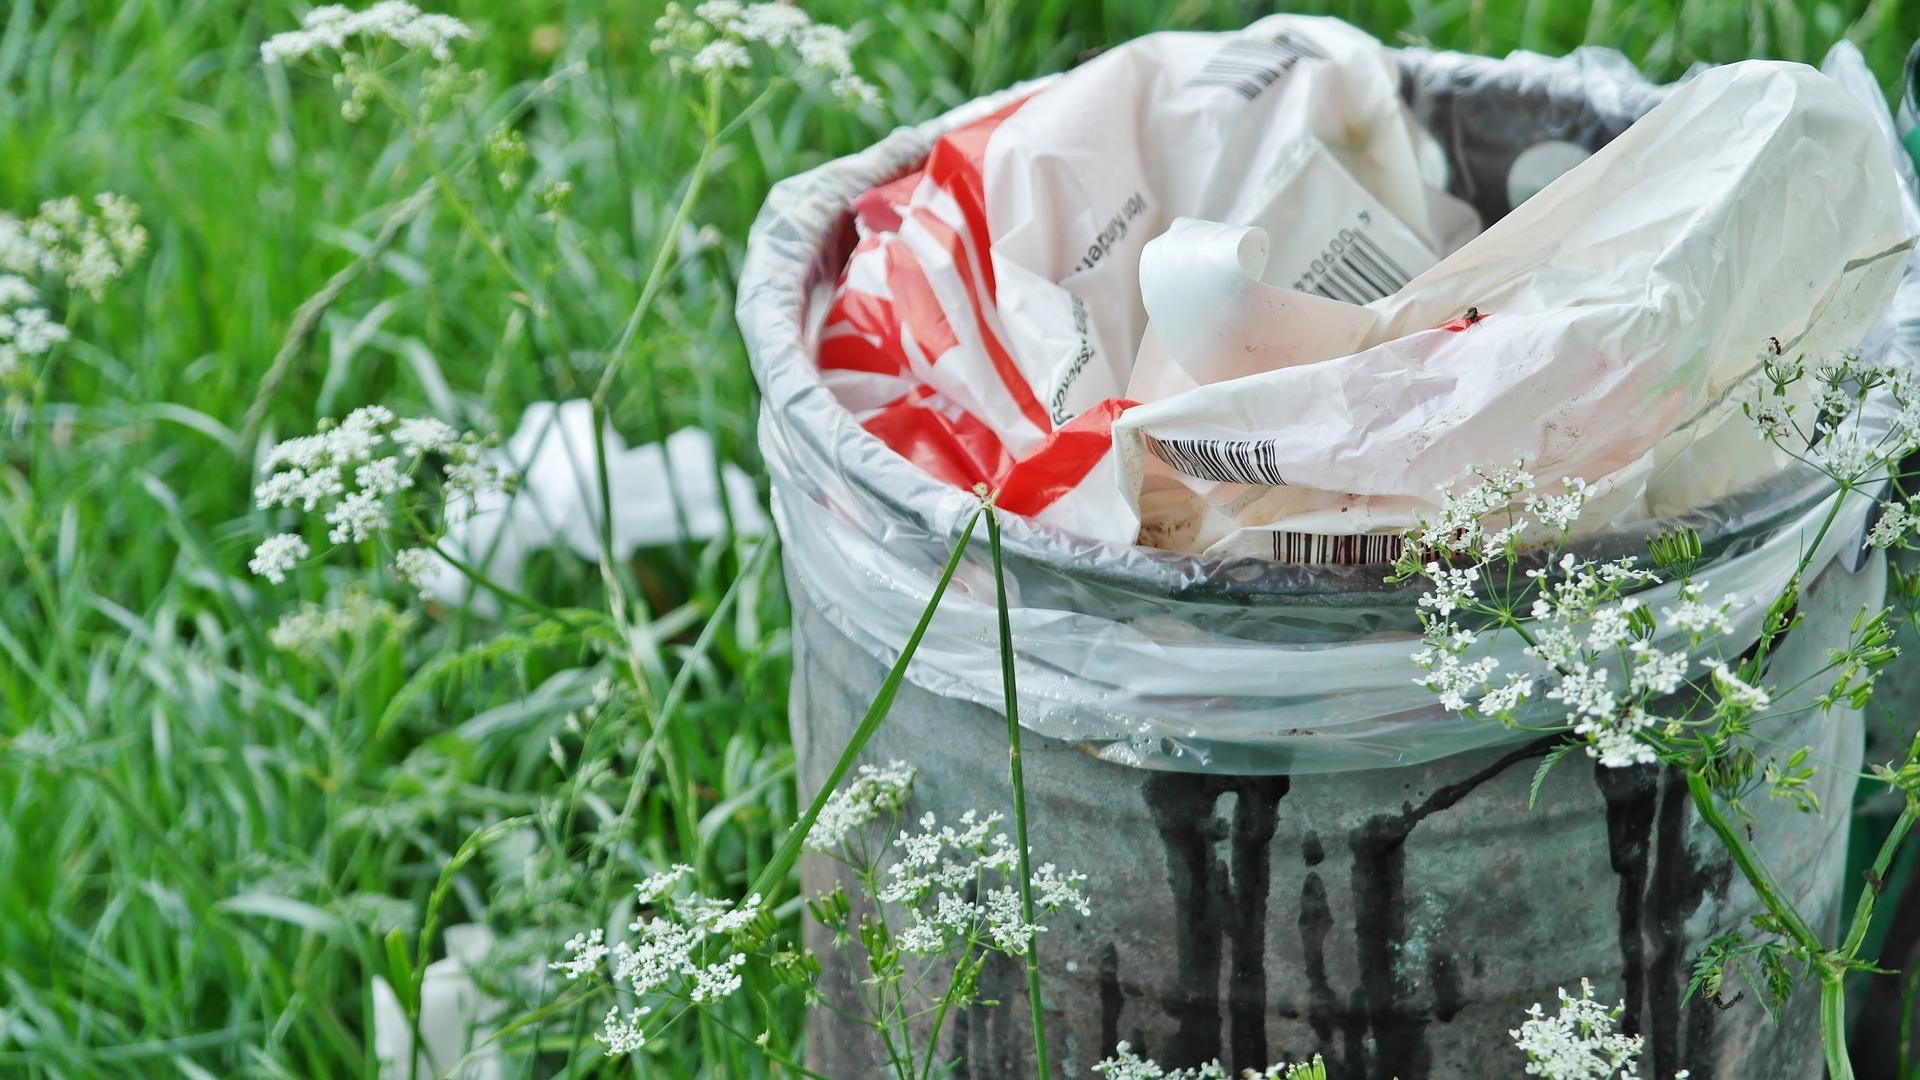 garbage-can-1423840_1920.jpg